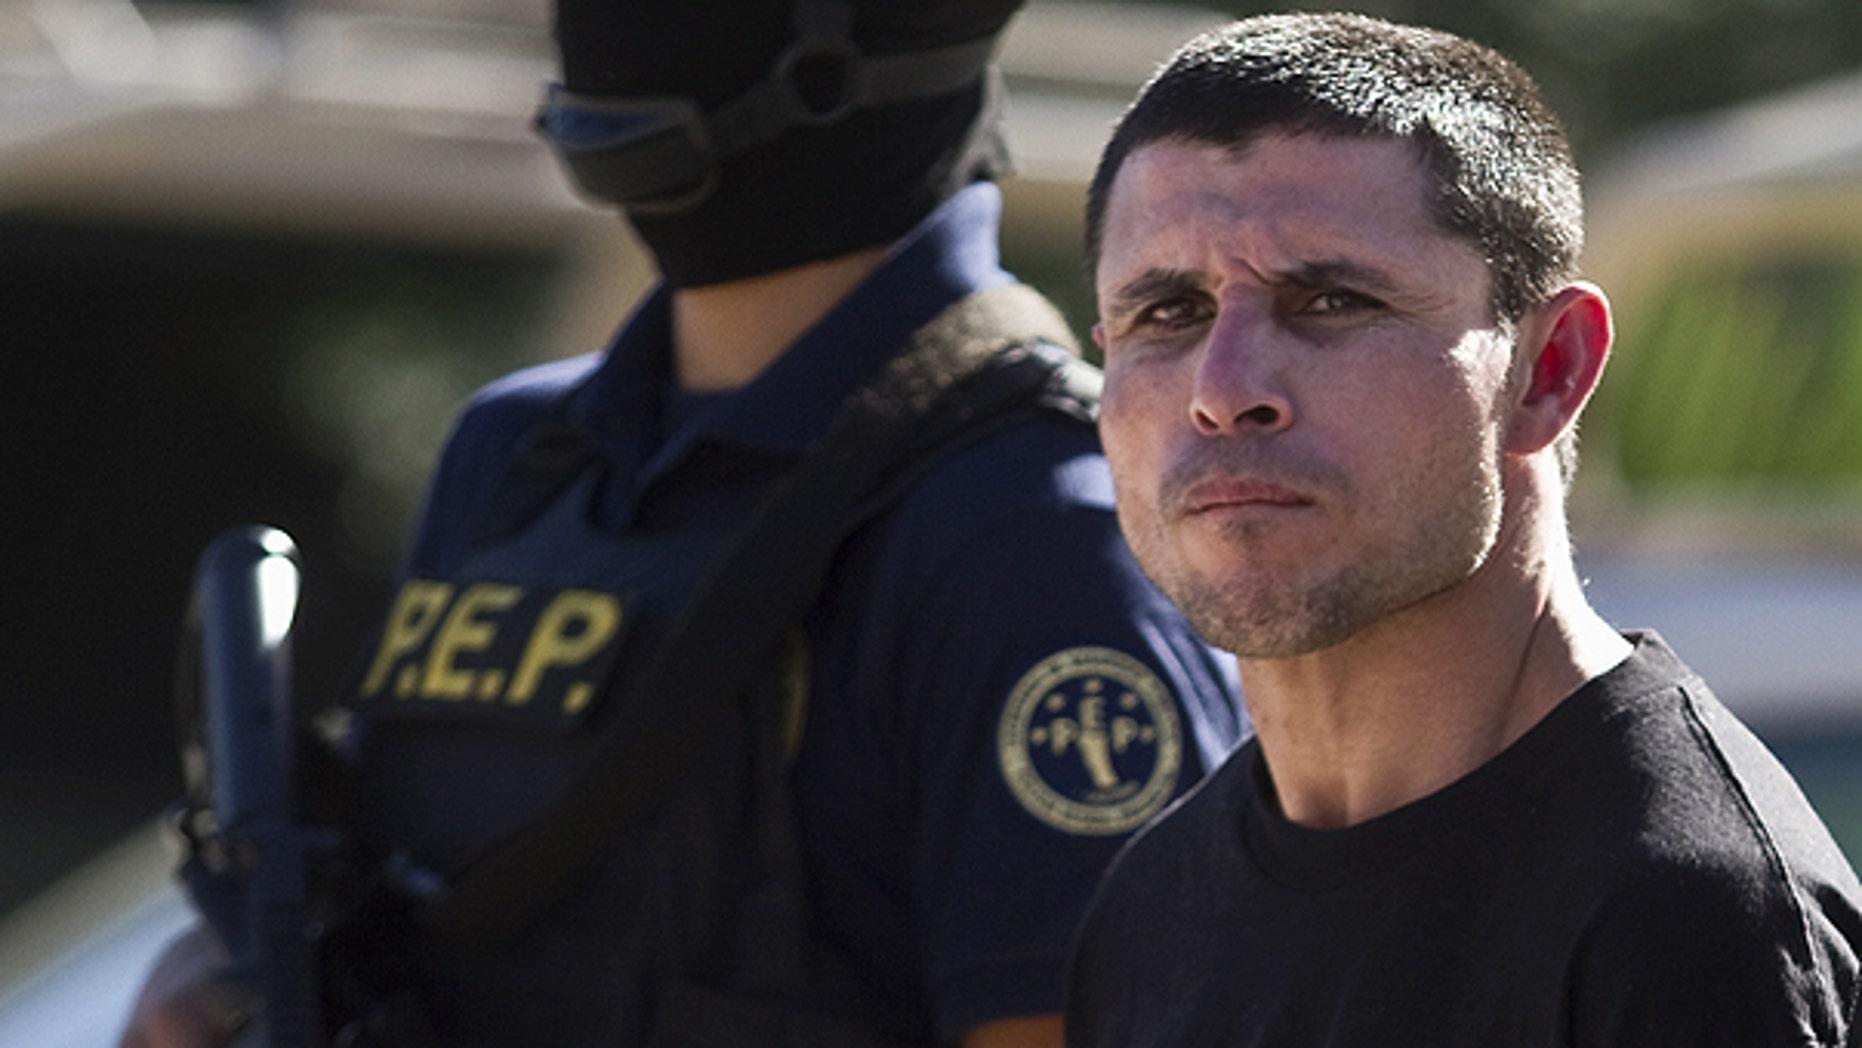 Jan. 20: A suspected member of the Sinaloa drug cartel, Juan Miguel Valle Beltran, right, aka 'El Boxer' is presented to the media in Tijuana, Mexico.